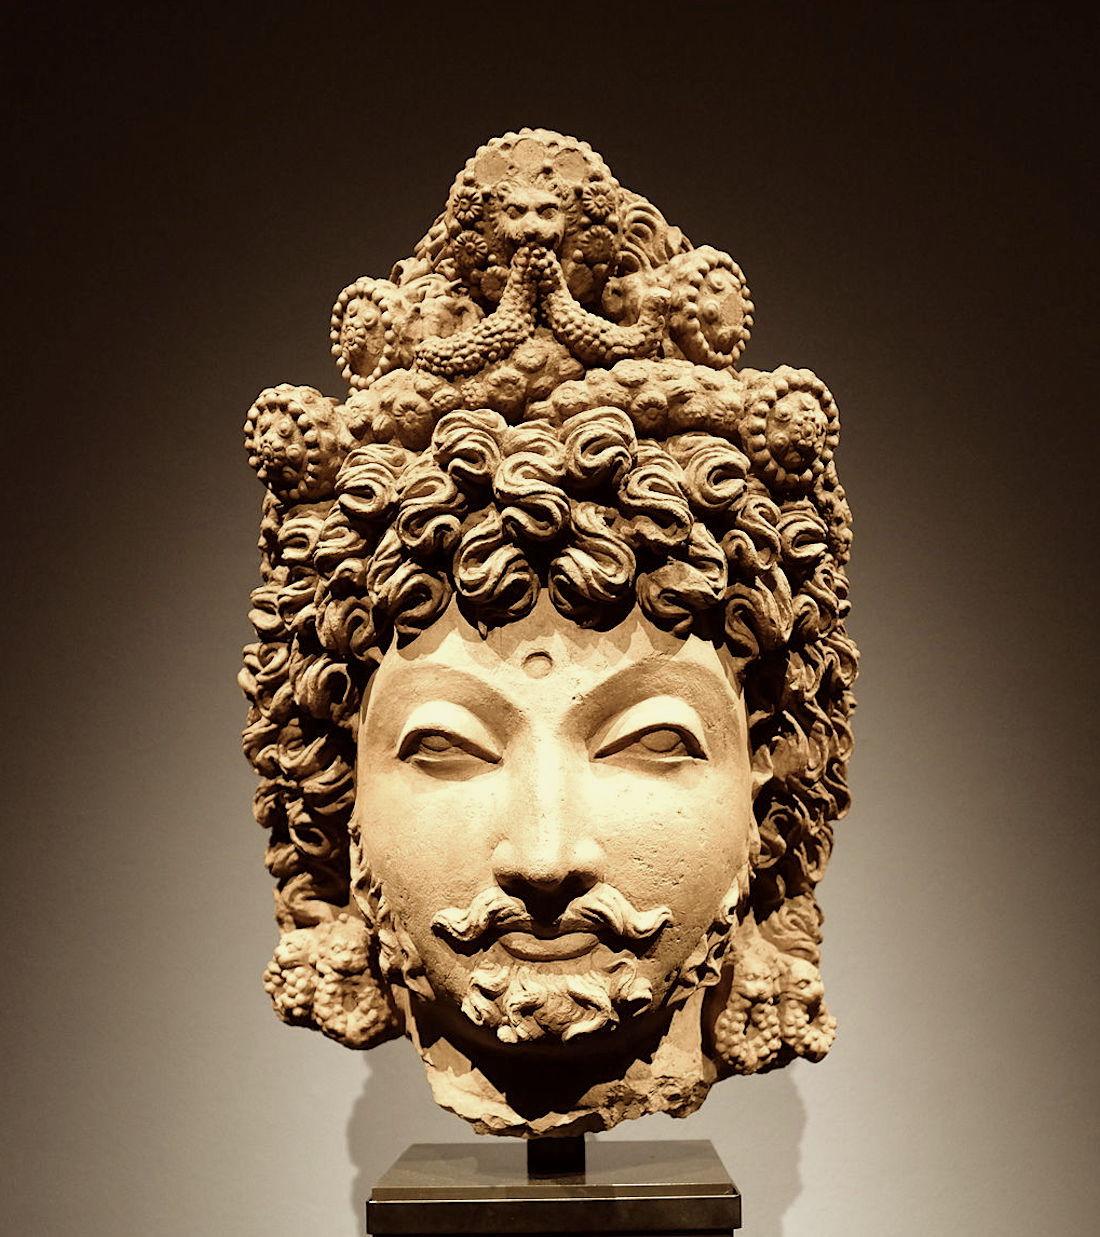 Bodhisattva head, Gandhara, Século IV. ACM